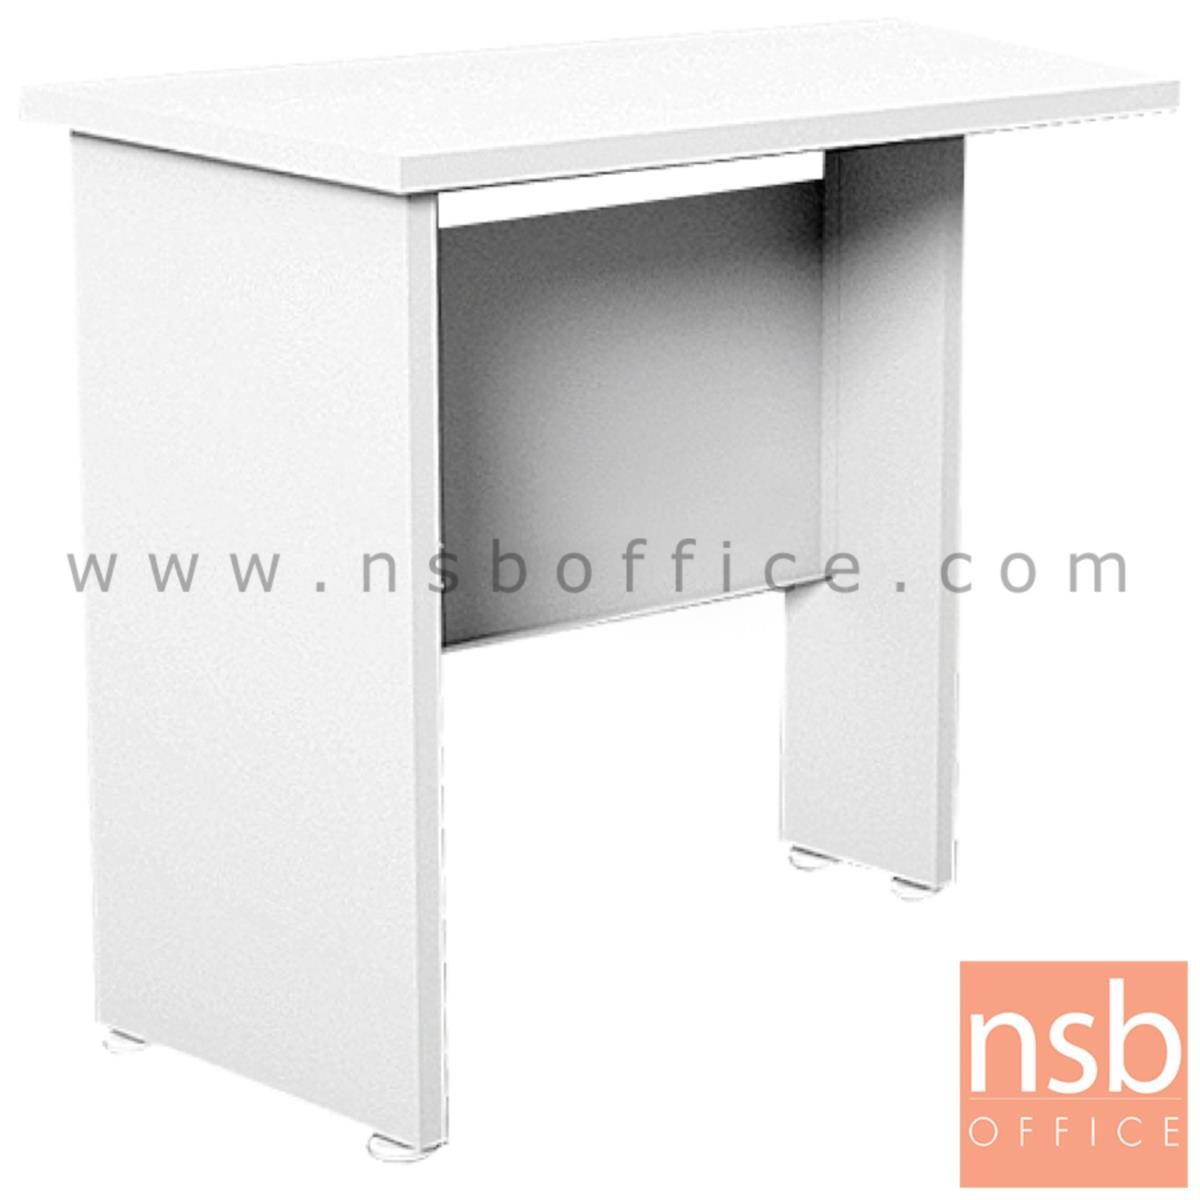 A20A031:โต๊ะเข้ามุม  รุ่น Nightlight (ไนท์ไลท์) ขนาด 80W cm. สีขาวล้วน